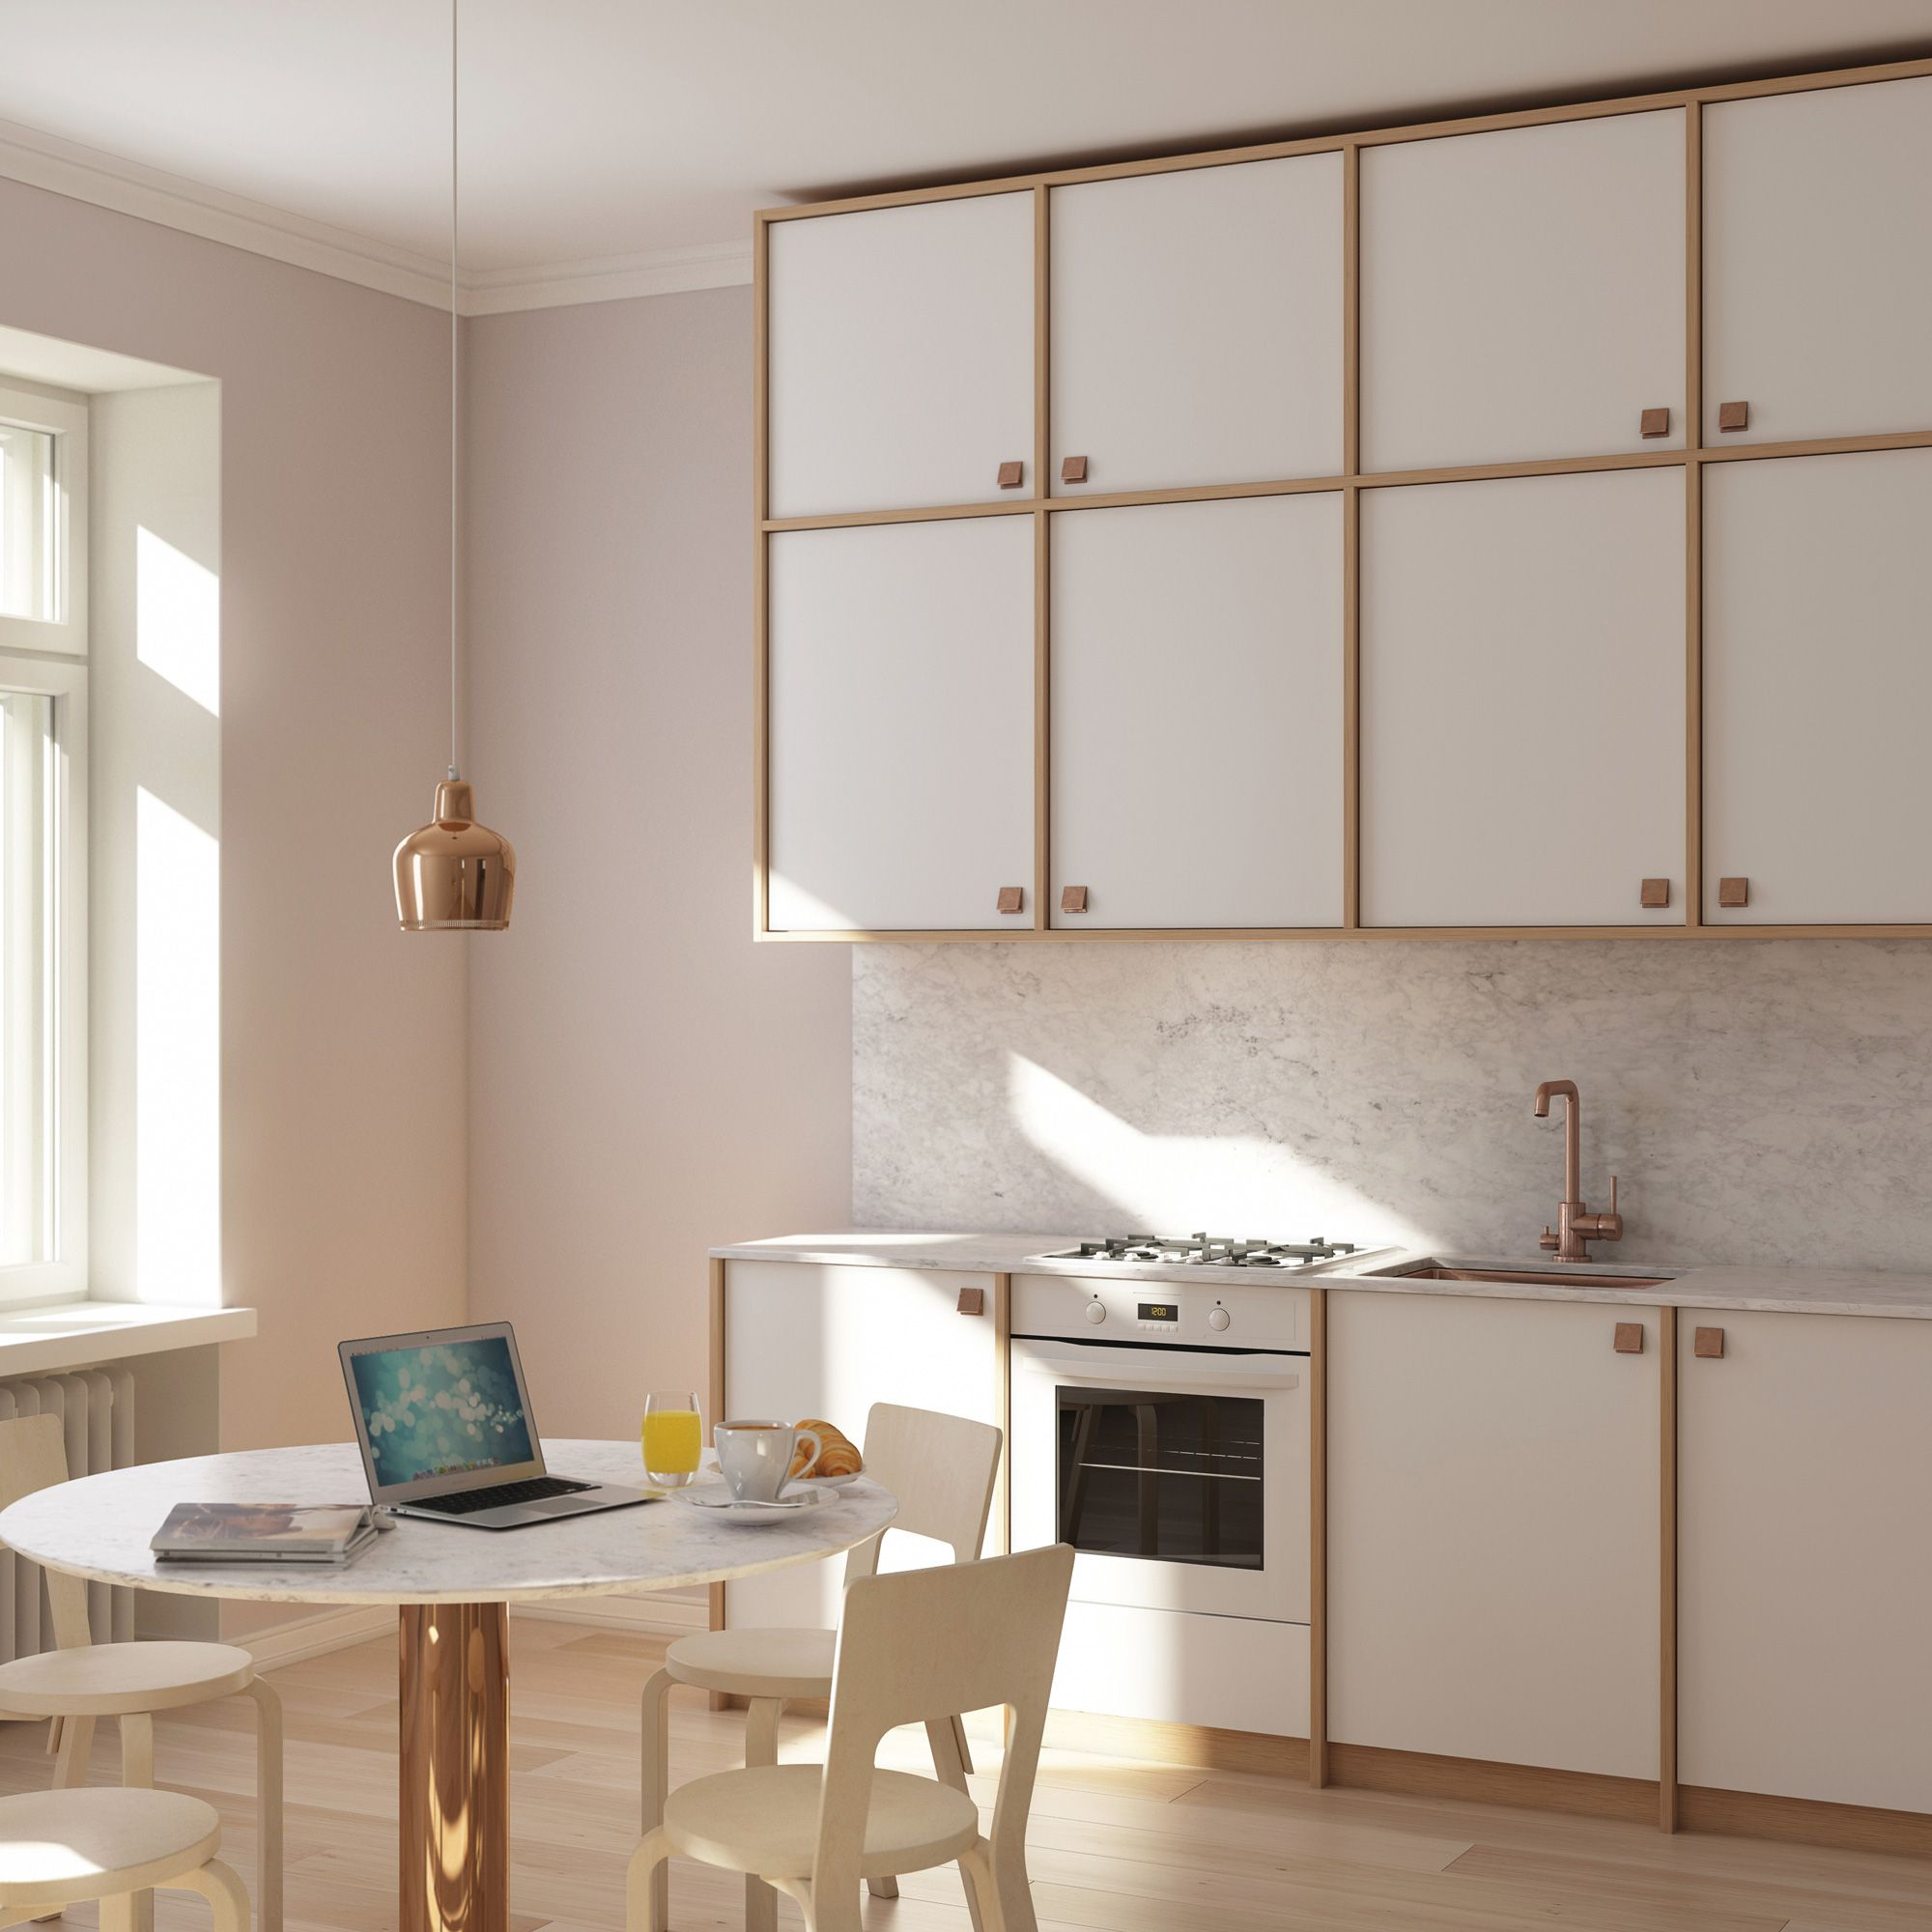 Kitchen Remodel 101 Stunning Ideas For Your Kitchen Design: A Distinctive A.S.Helsingö Kitchen Design Based On IKEA